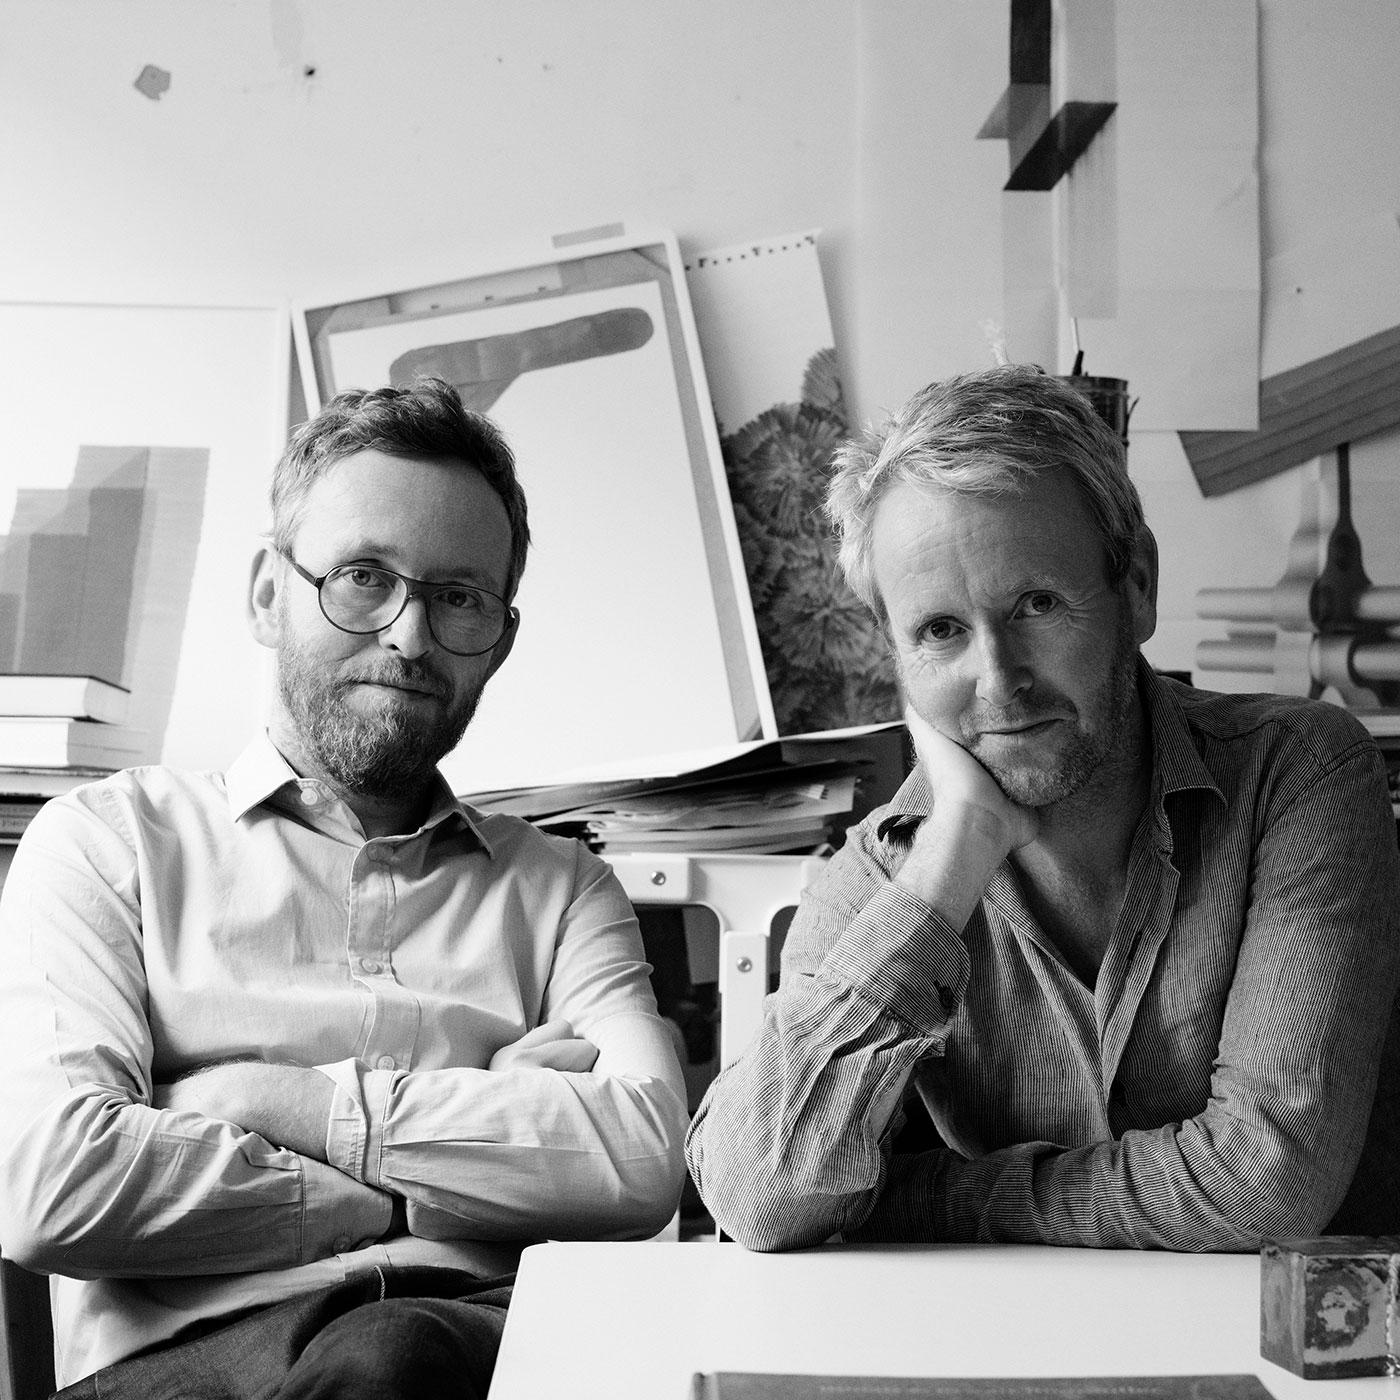 Ronan & Erwan Bouroullec ronan & erwan bouroullec - designer at nostraforma